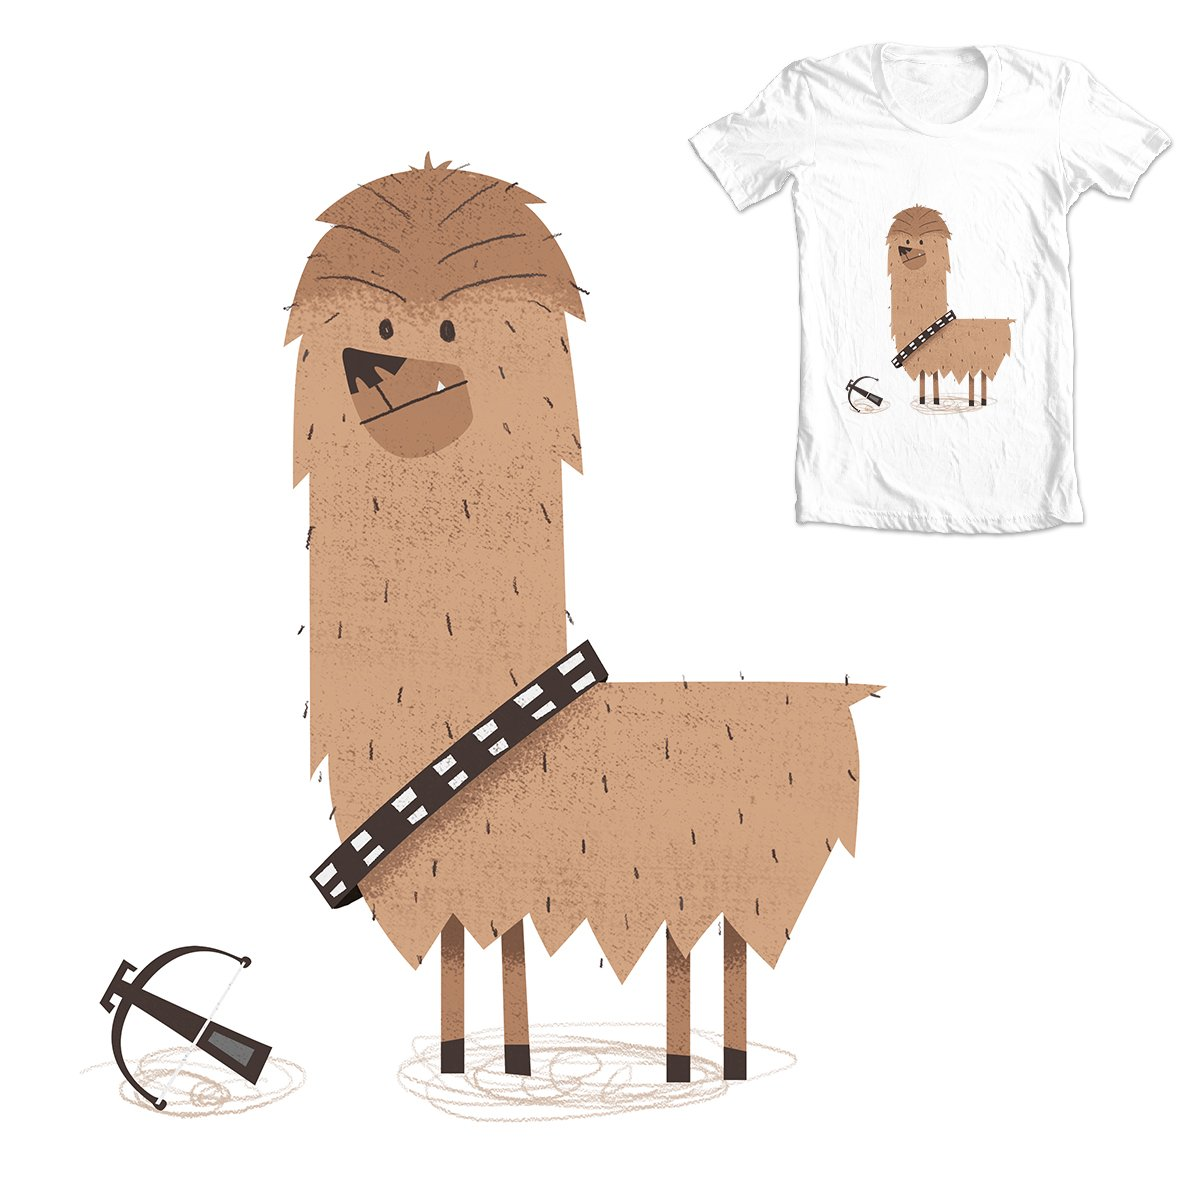 Alpaca Chewbacca Starwars Fanart Illustration